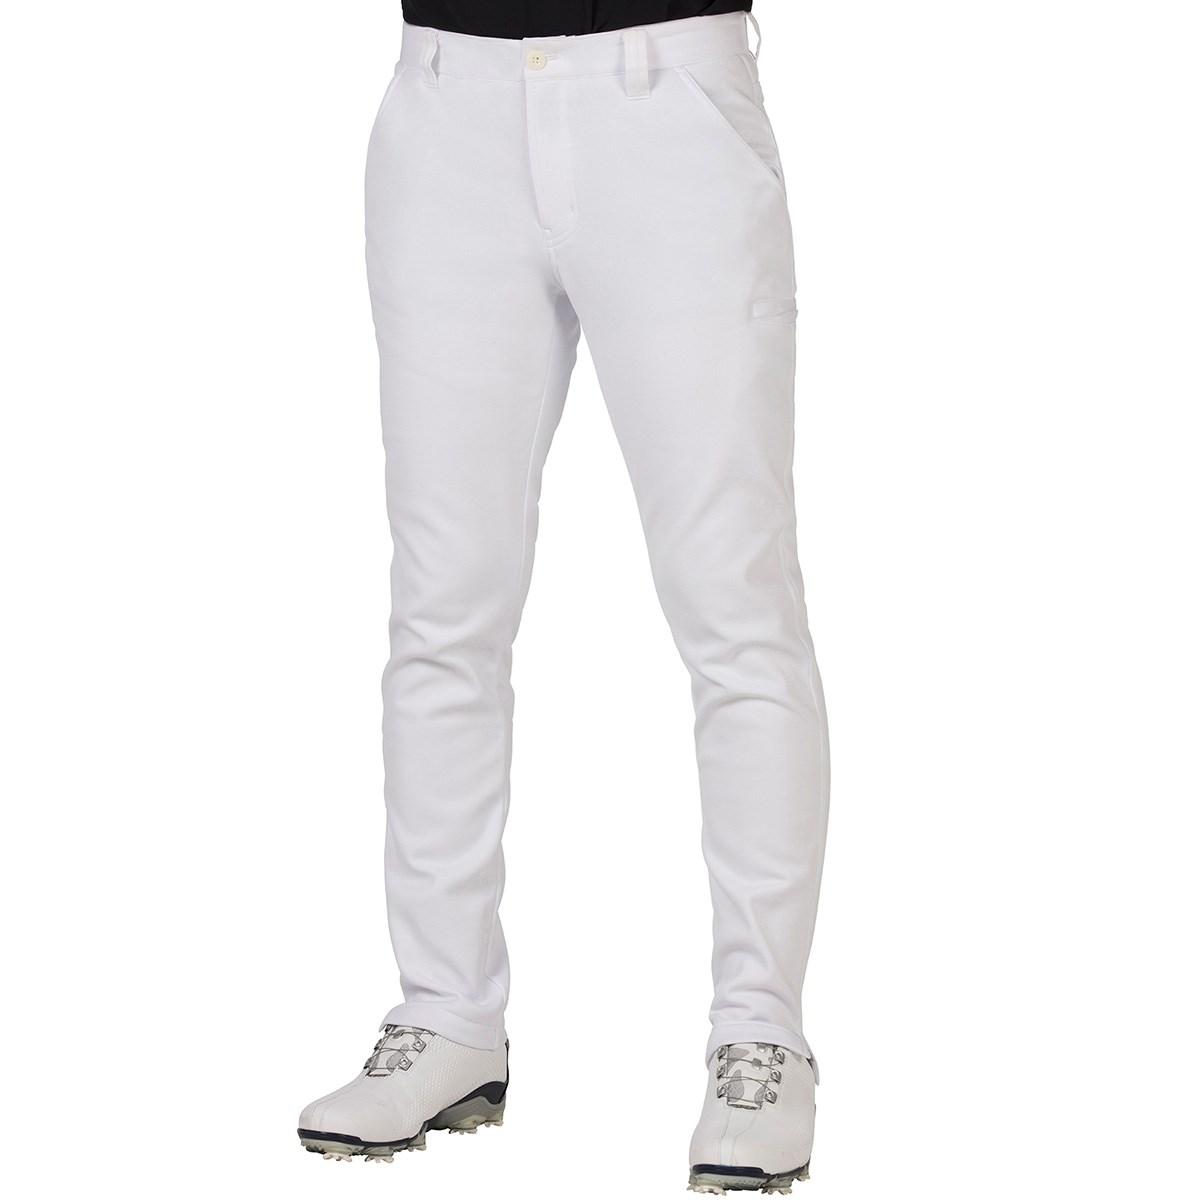 GDO オリジナル GDO ORIGINAL 7ポケットボンディングパンツ 股下82cm 2:ウエスト目安78-80 ホワイト